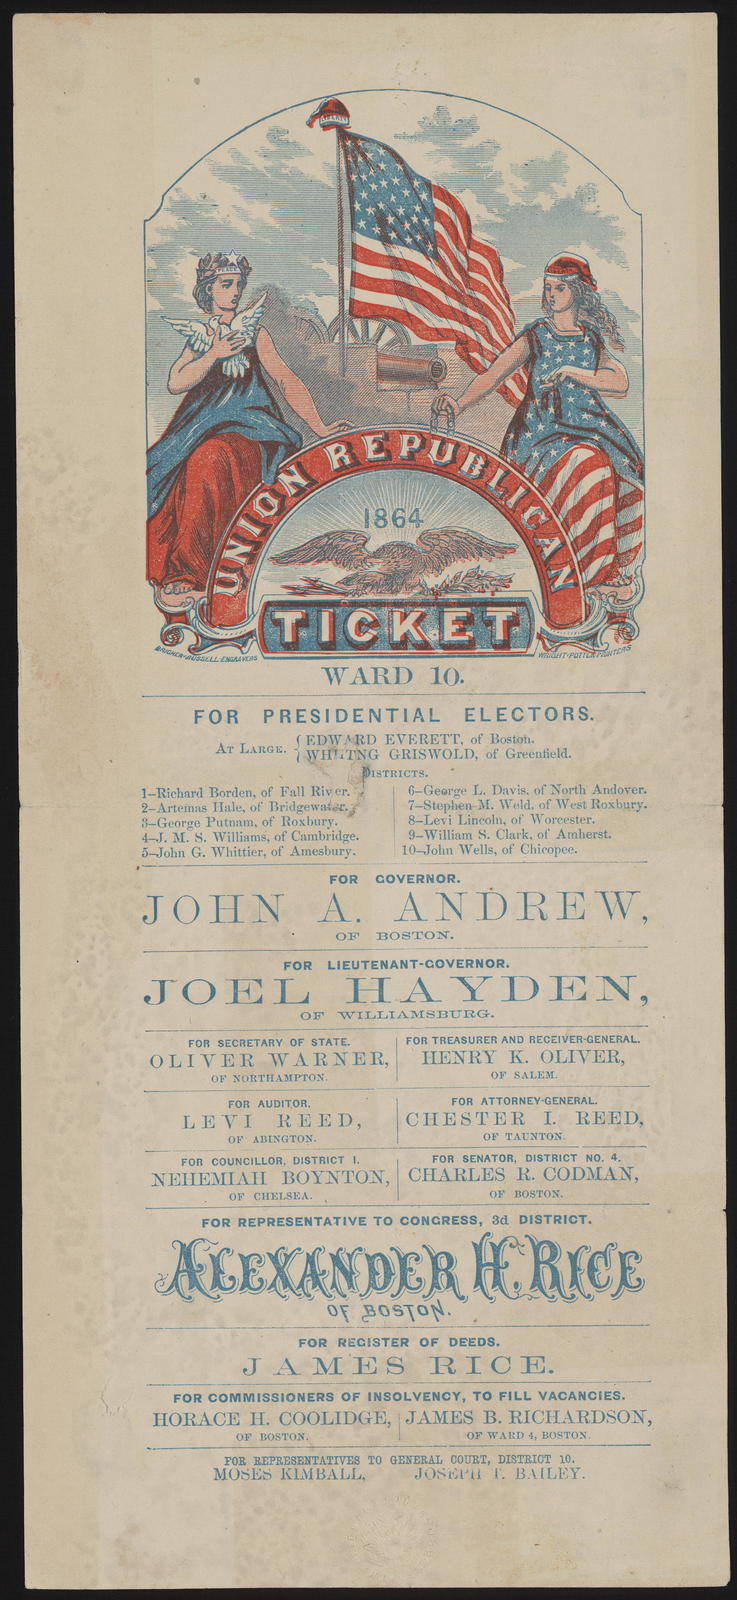 Union republican ticket. Ward 10. [Massachusetts campaign ticket]